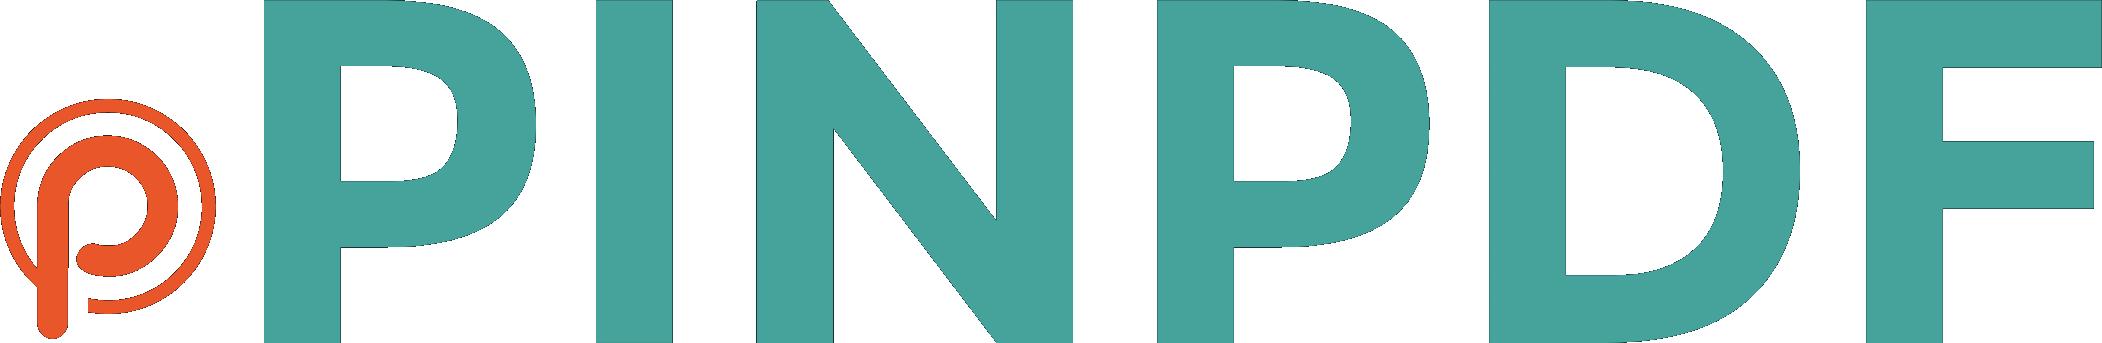 Novagalicia banco empresas online dating